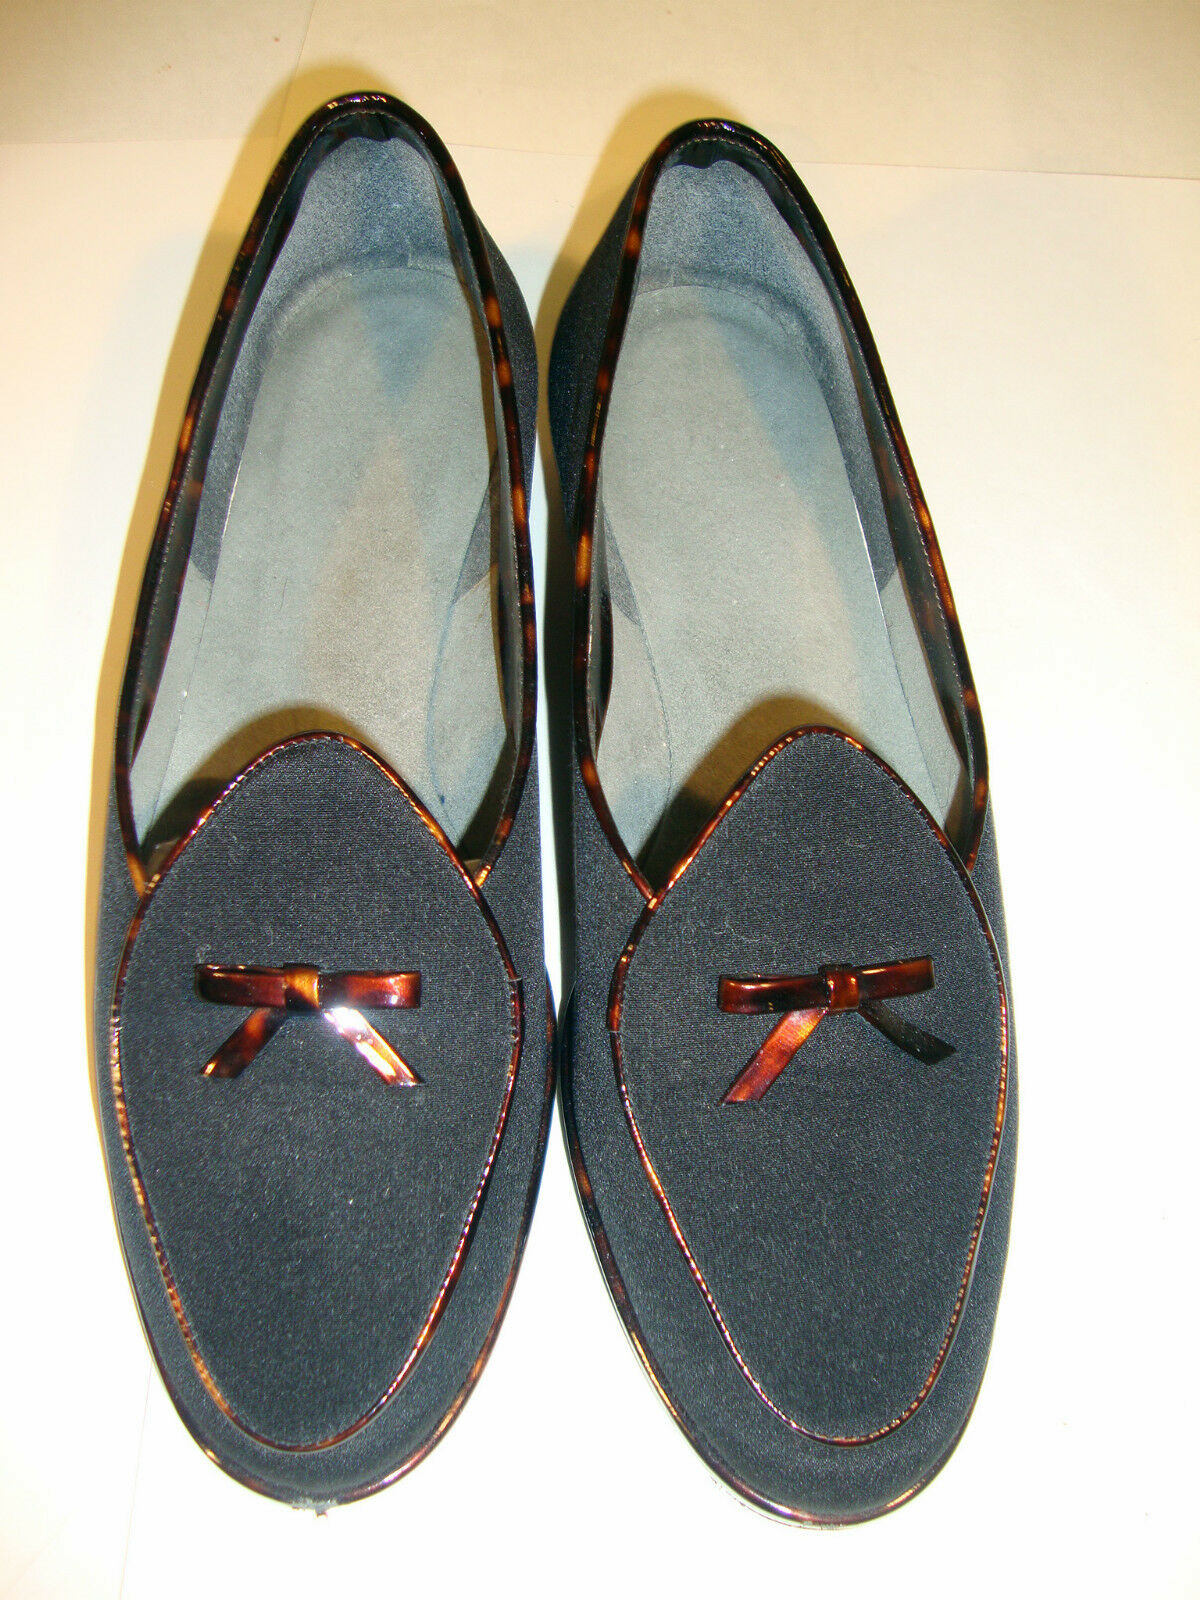 Stuart Weitzman nero Wood Patent donna Loafers scarpe Dimensione 37.5 Bow Spain